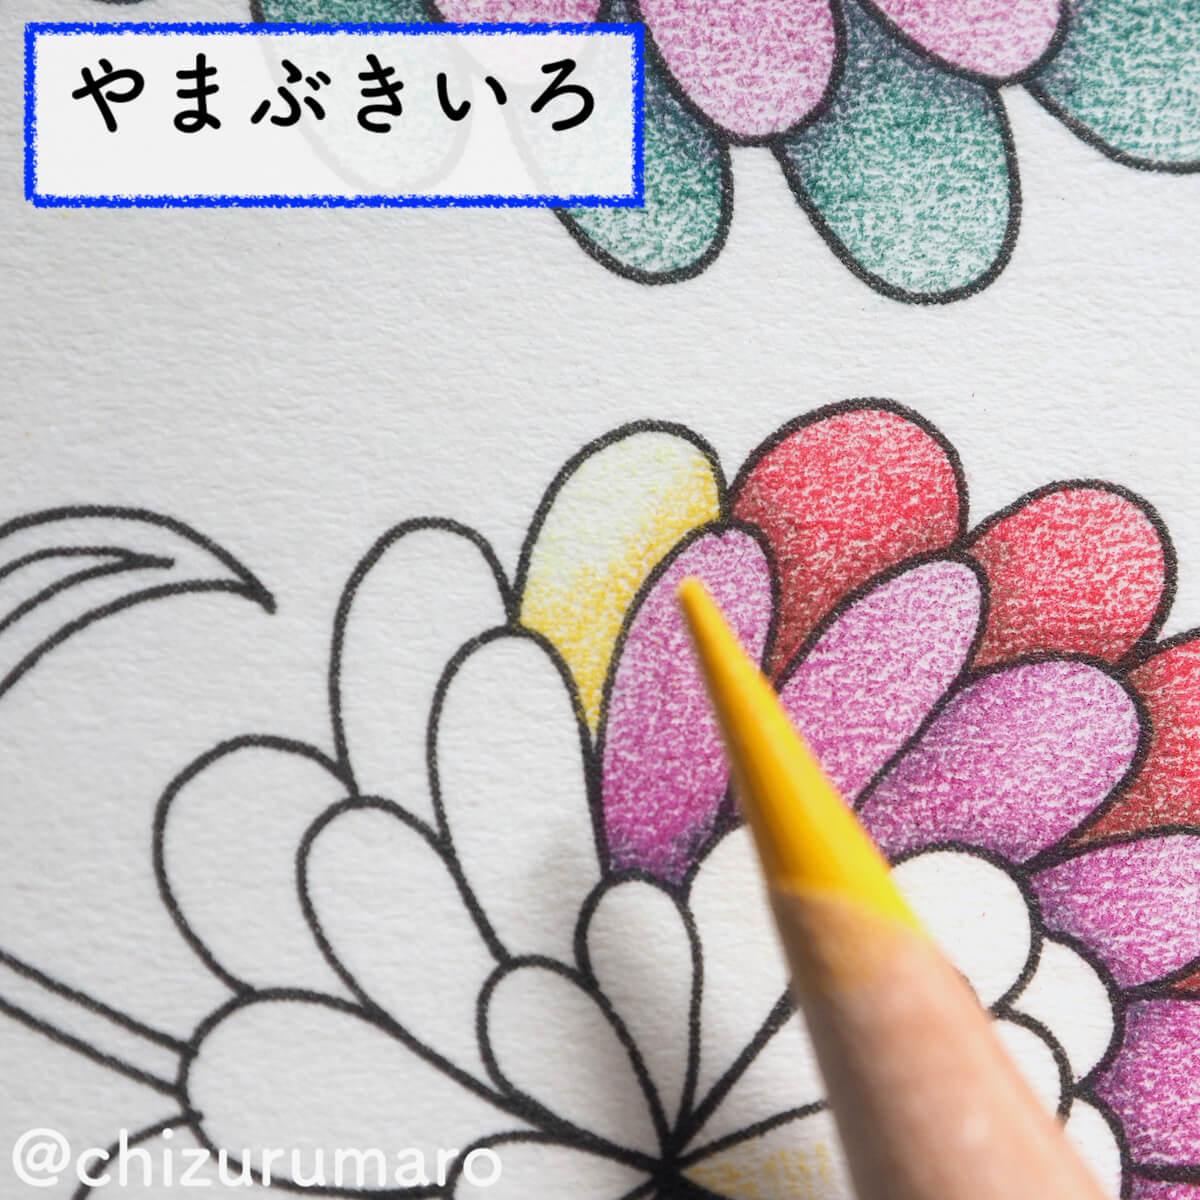 f:id:chizurumaro:20200326115131j:plain